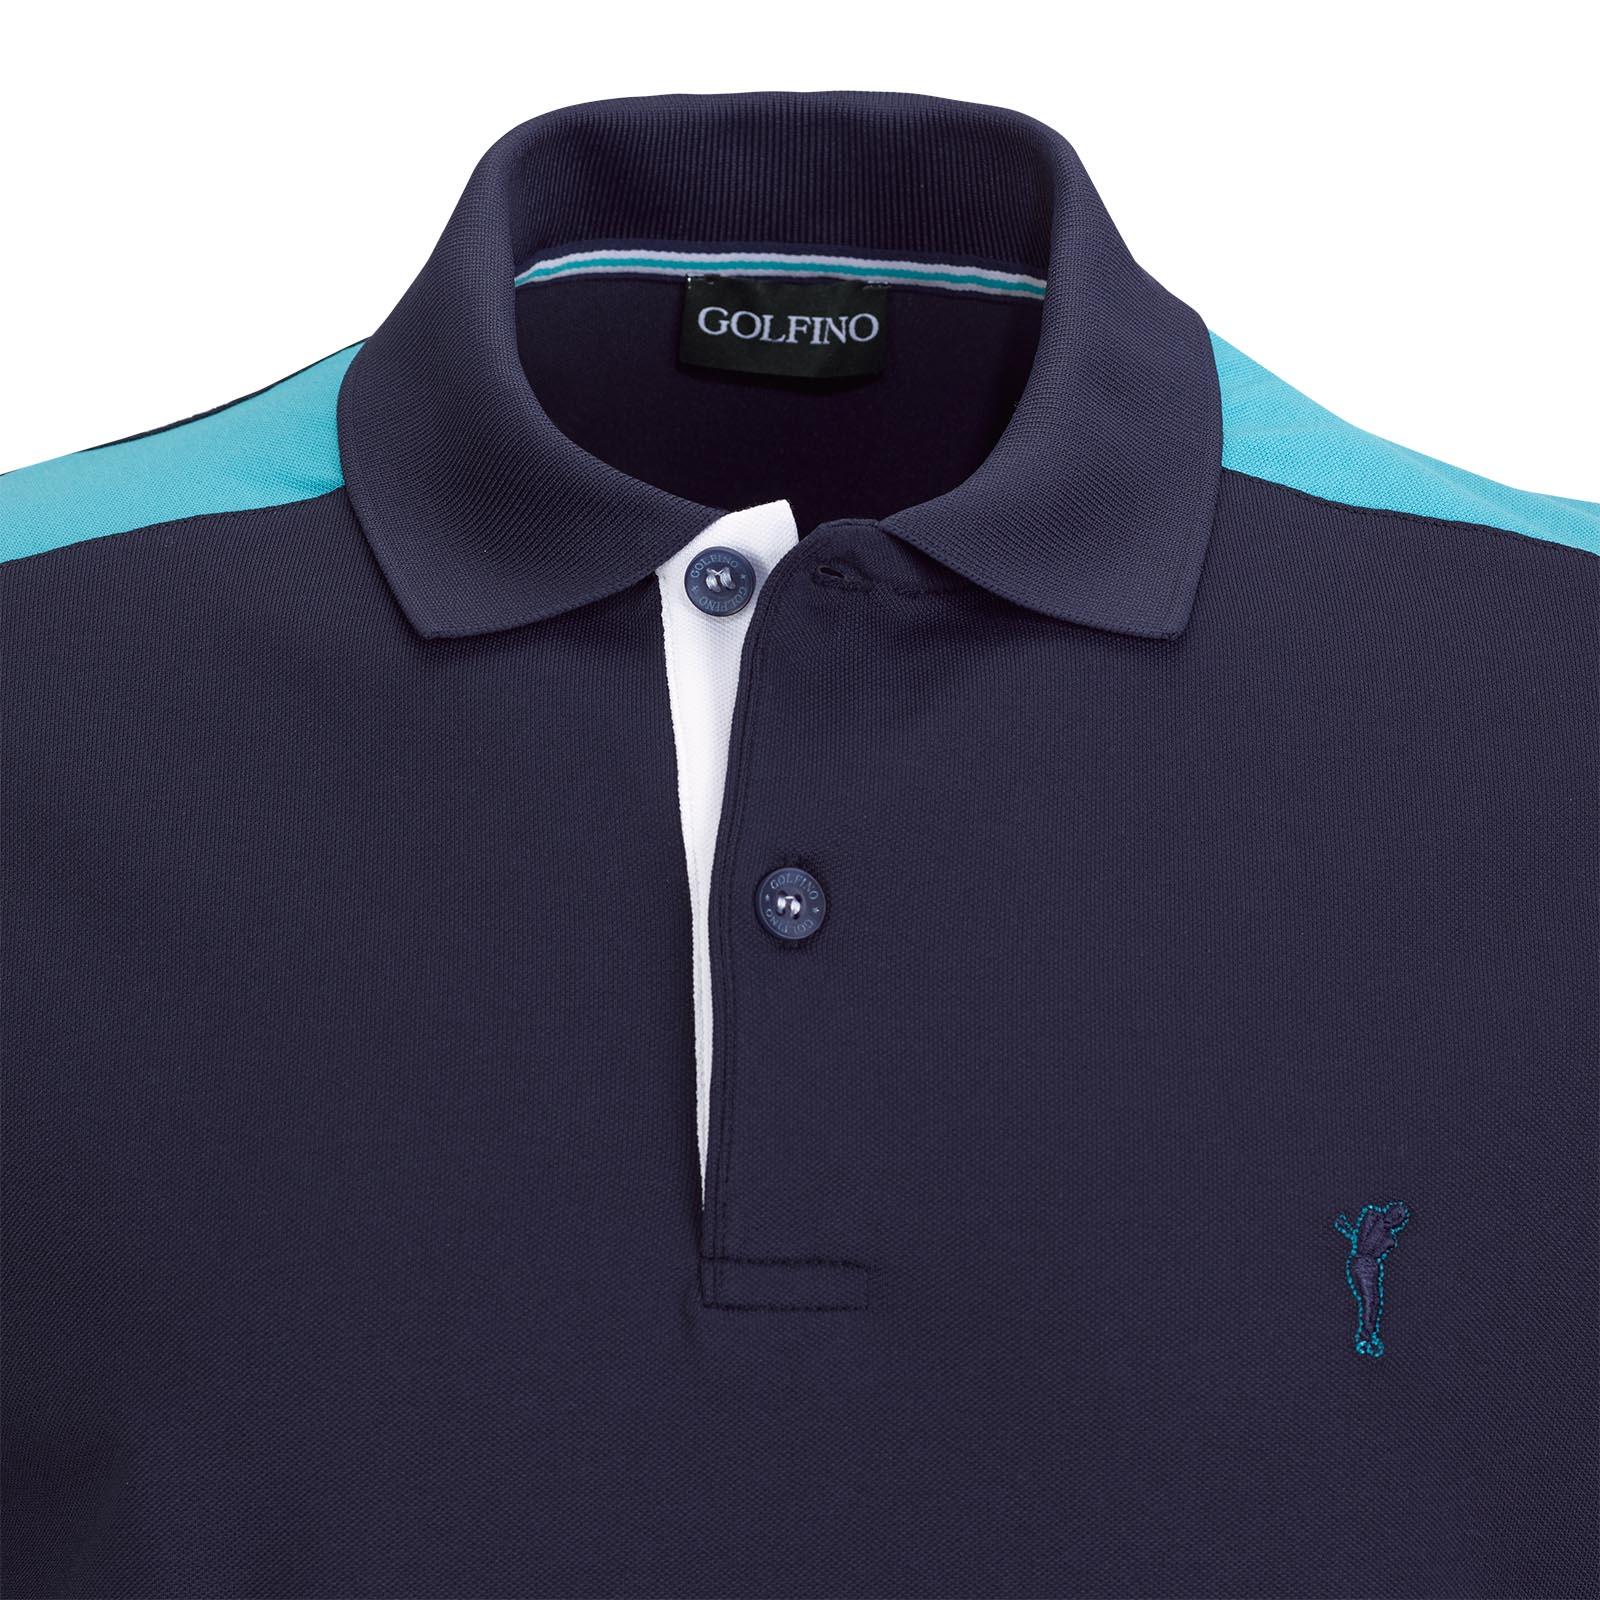 Herren Kurzarm Sunprotection Funktions-Golfpolo im Pro-Look